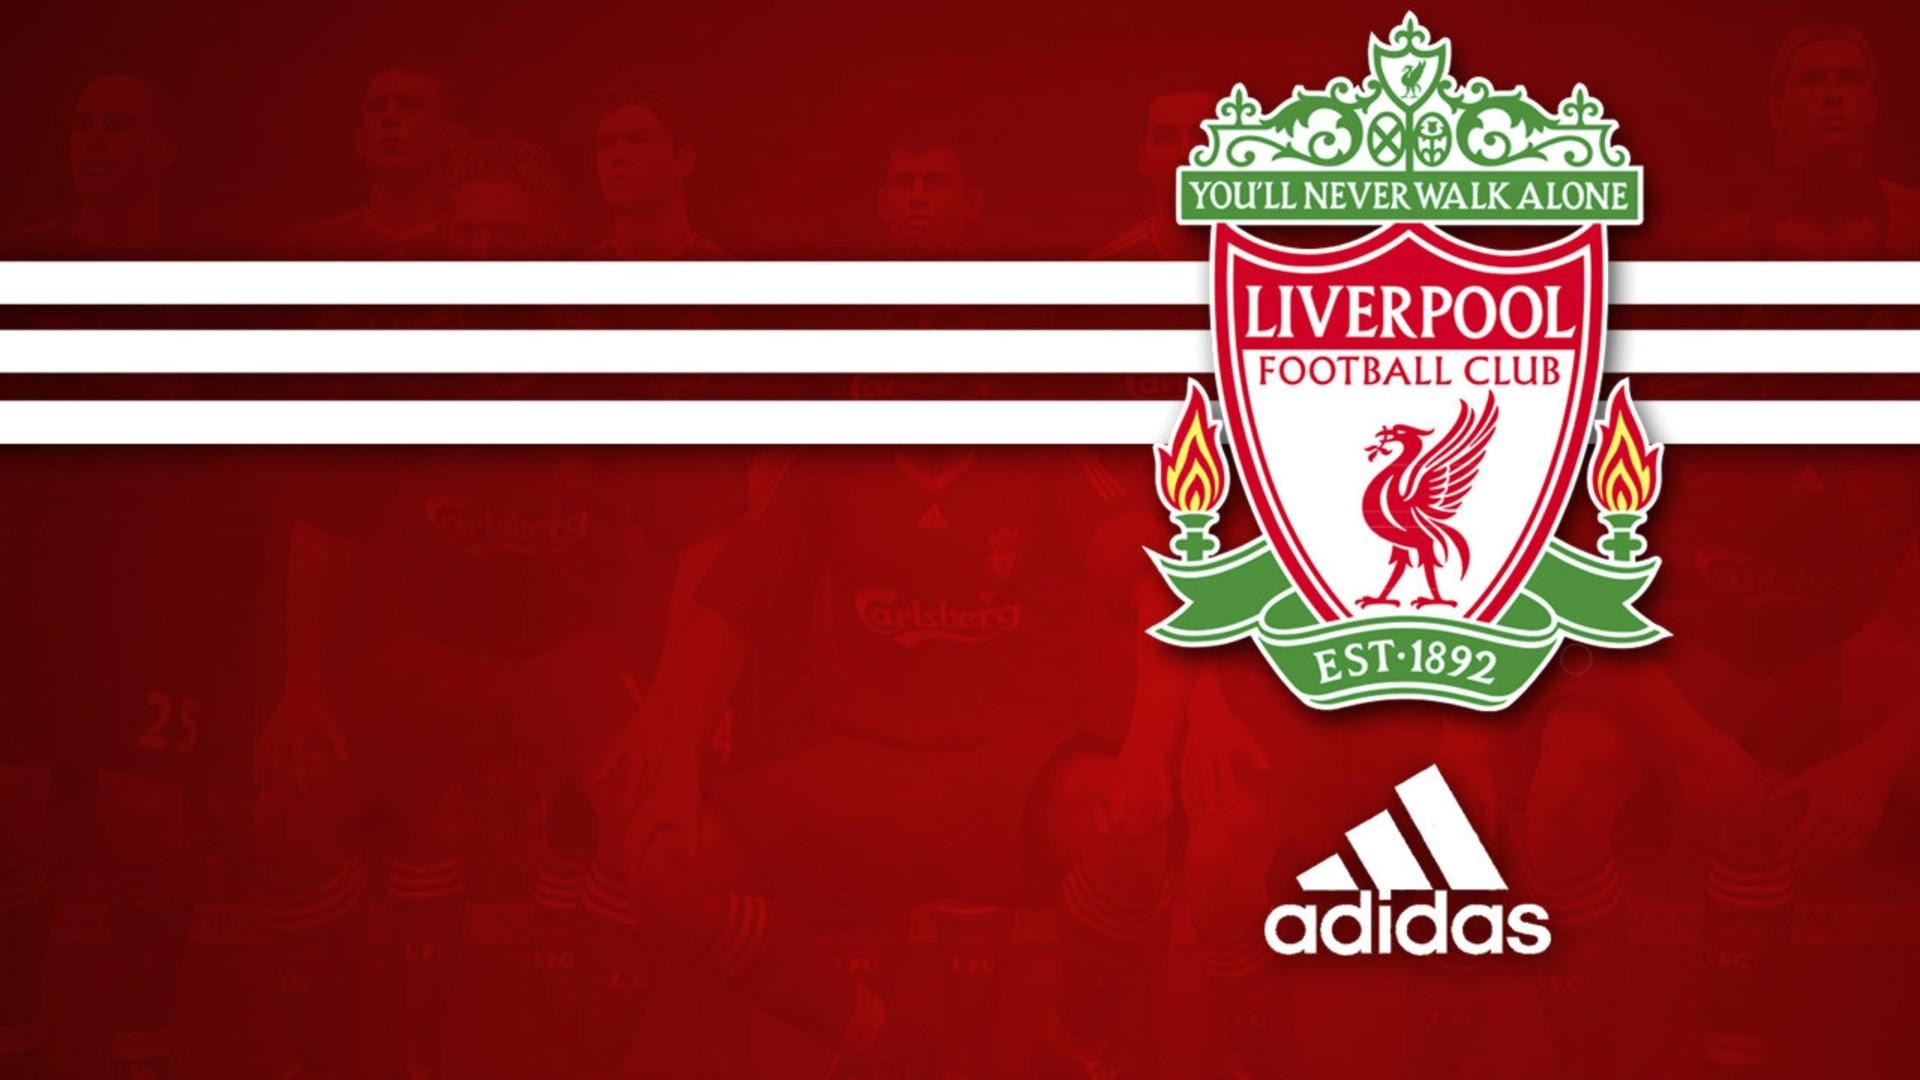 Liverpool Wallpaper Hd 1318607 Hd Wallpaper Backgrounds Download